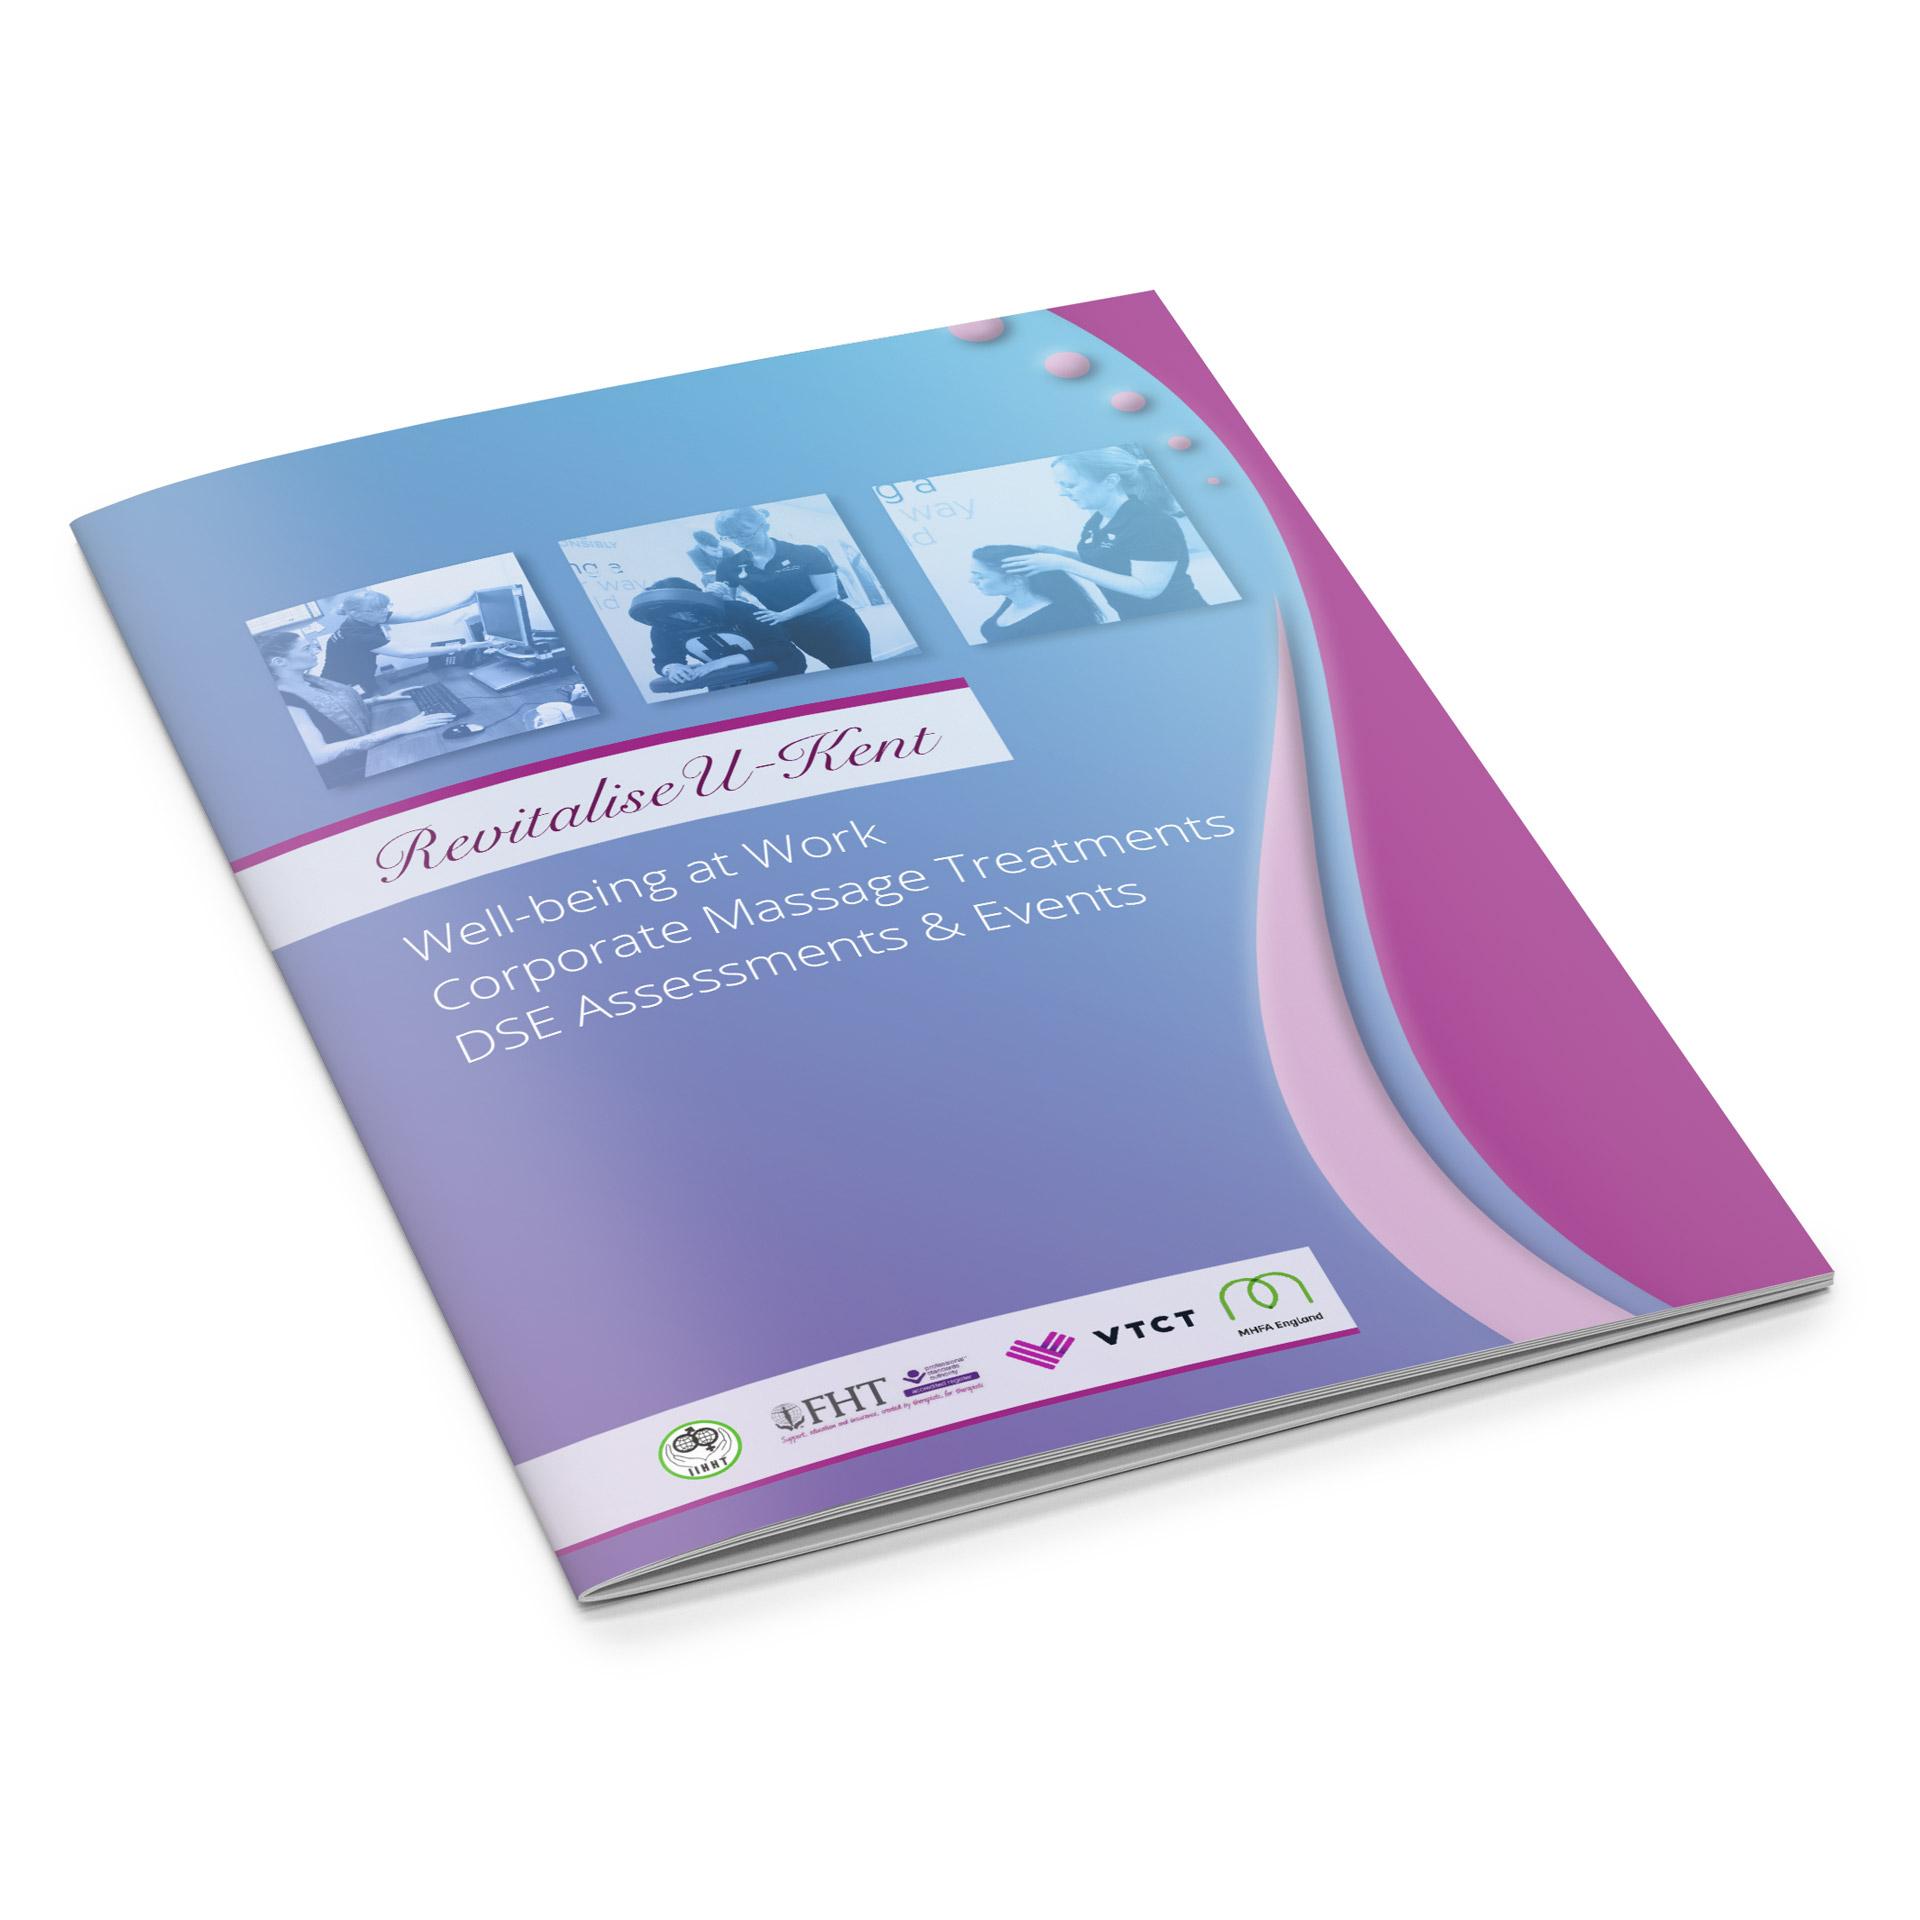 Revitalise U Brochure Cover